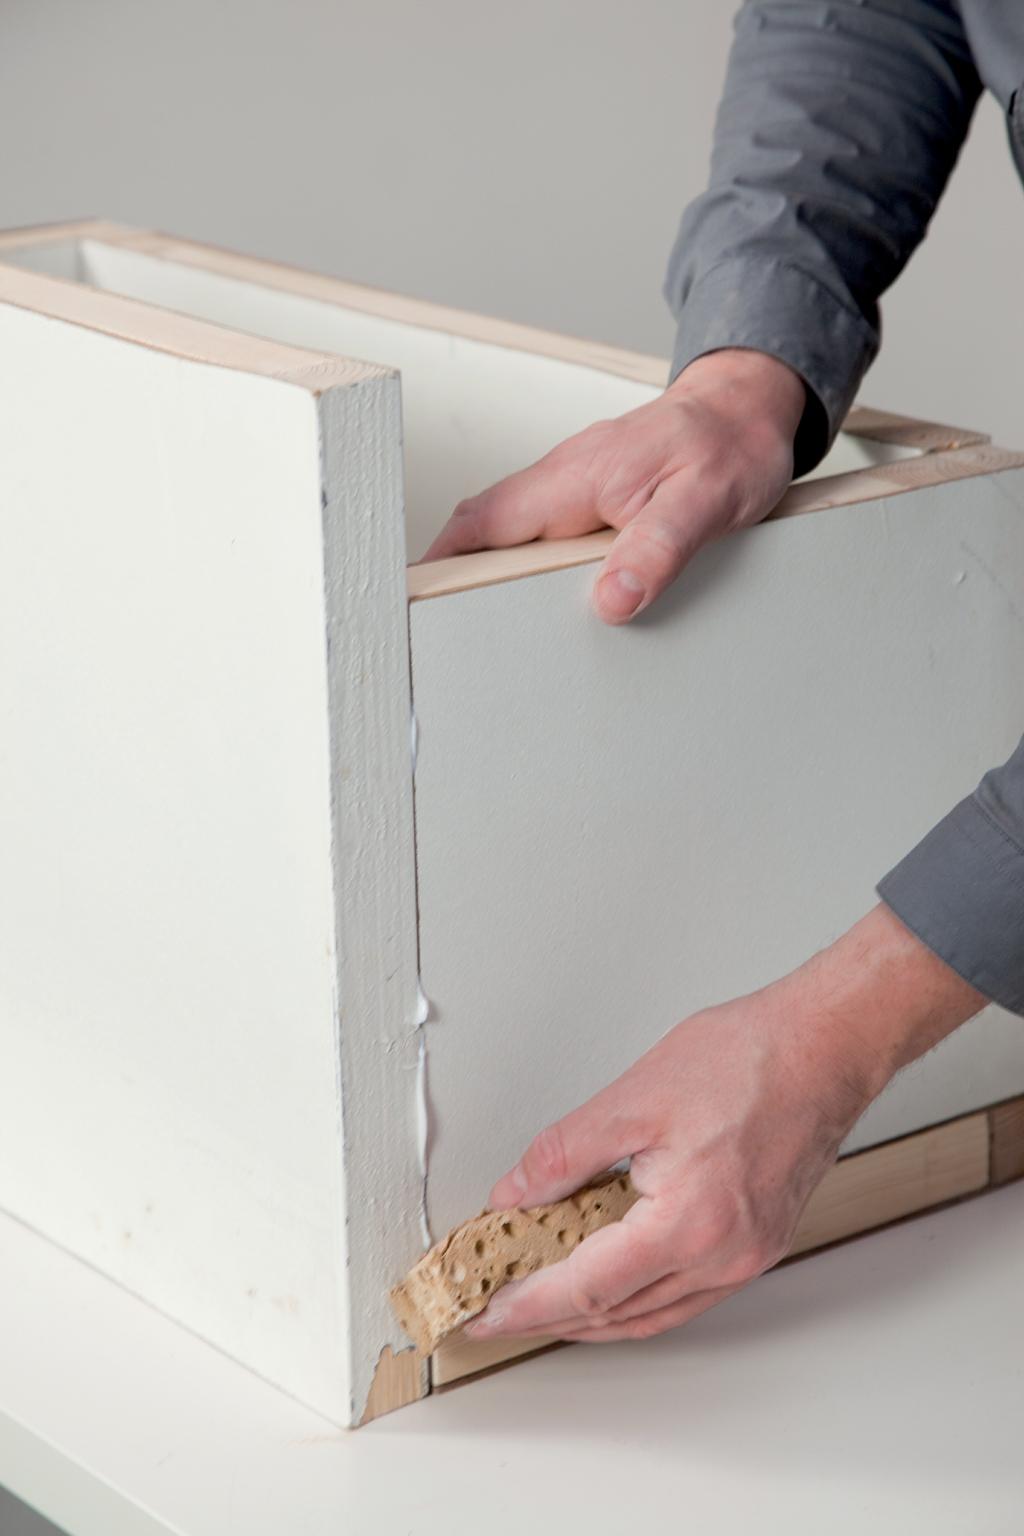 Transformer une porte en coffre